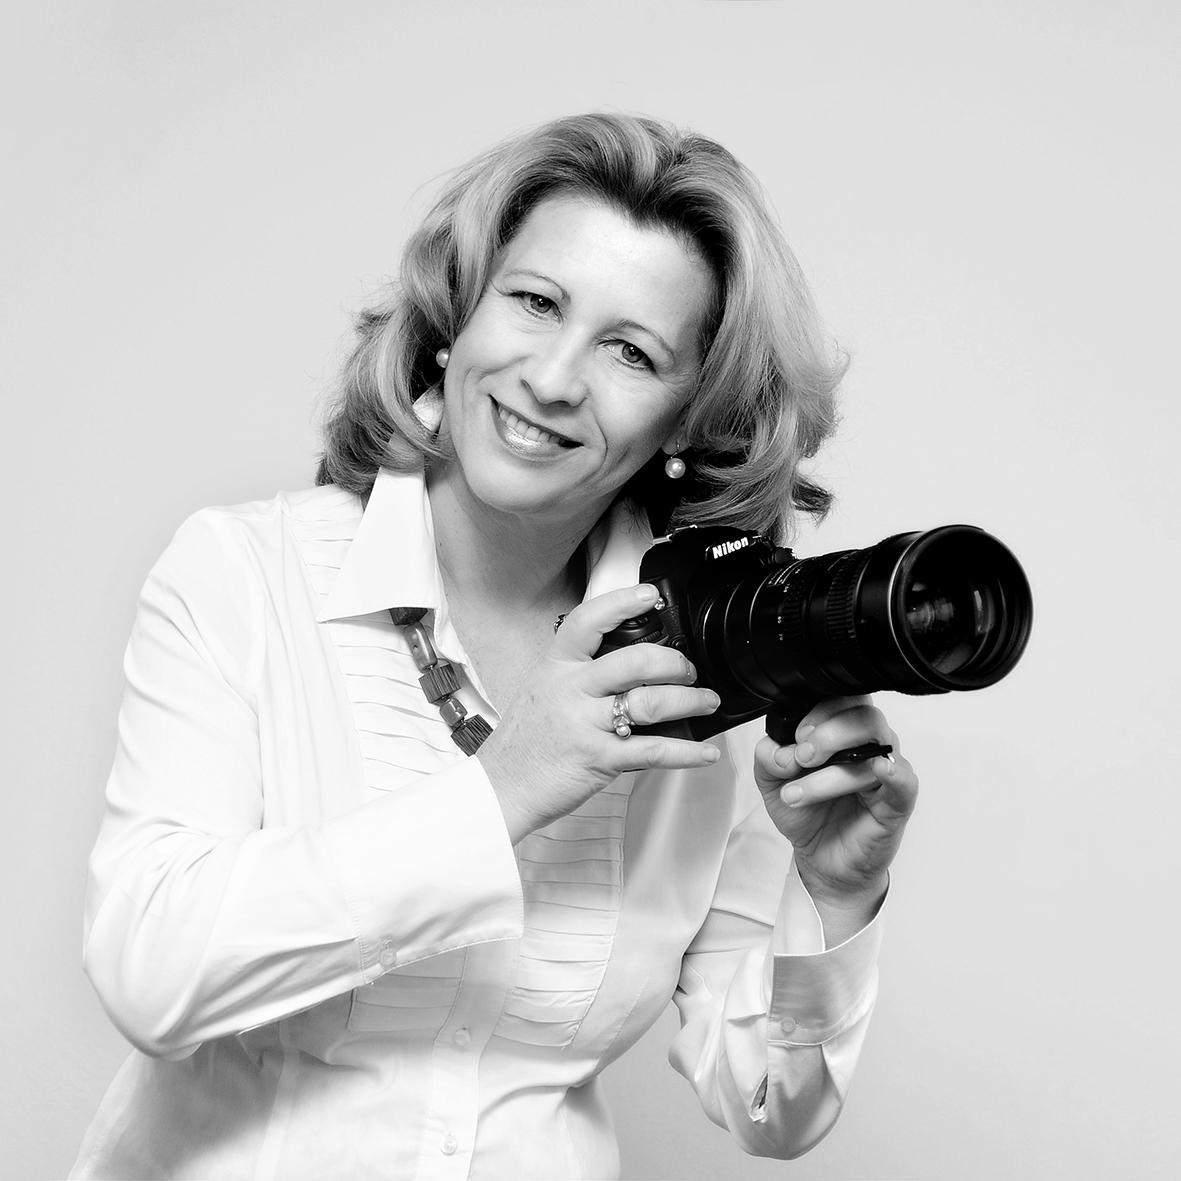 Rainer Gabriela, 9063 Maria Saal - Herold